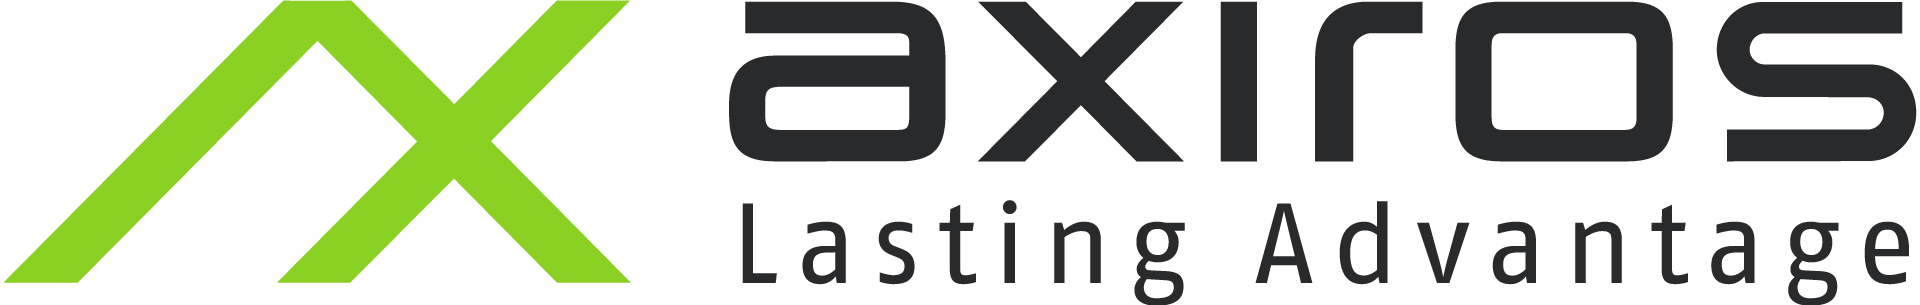 Axiros North America, Inc. Logo